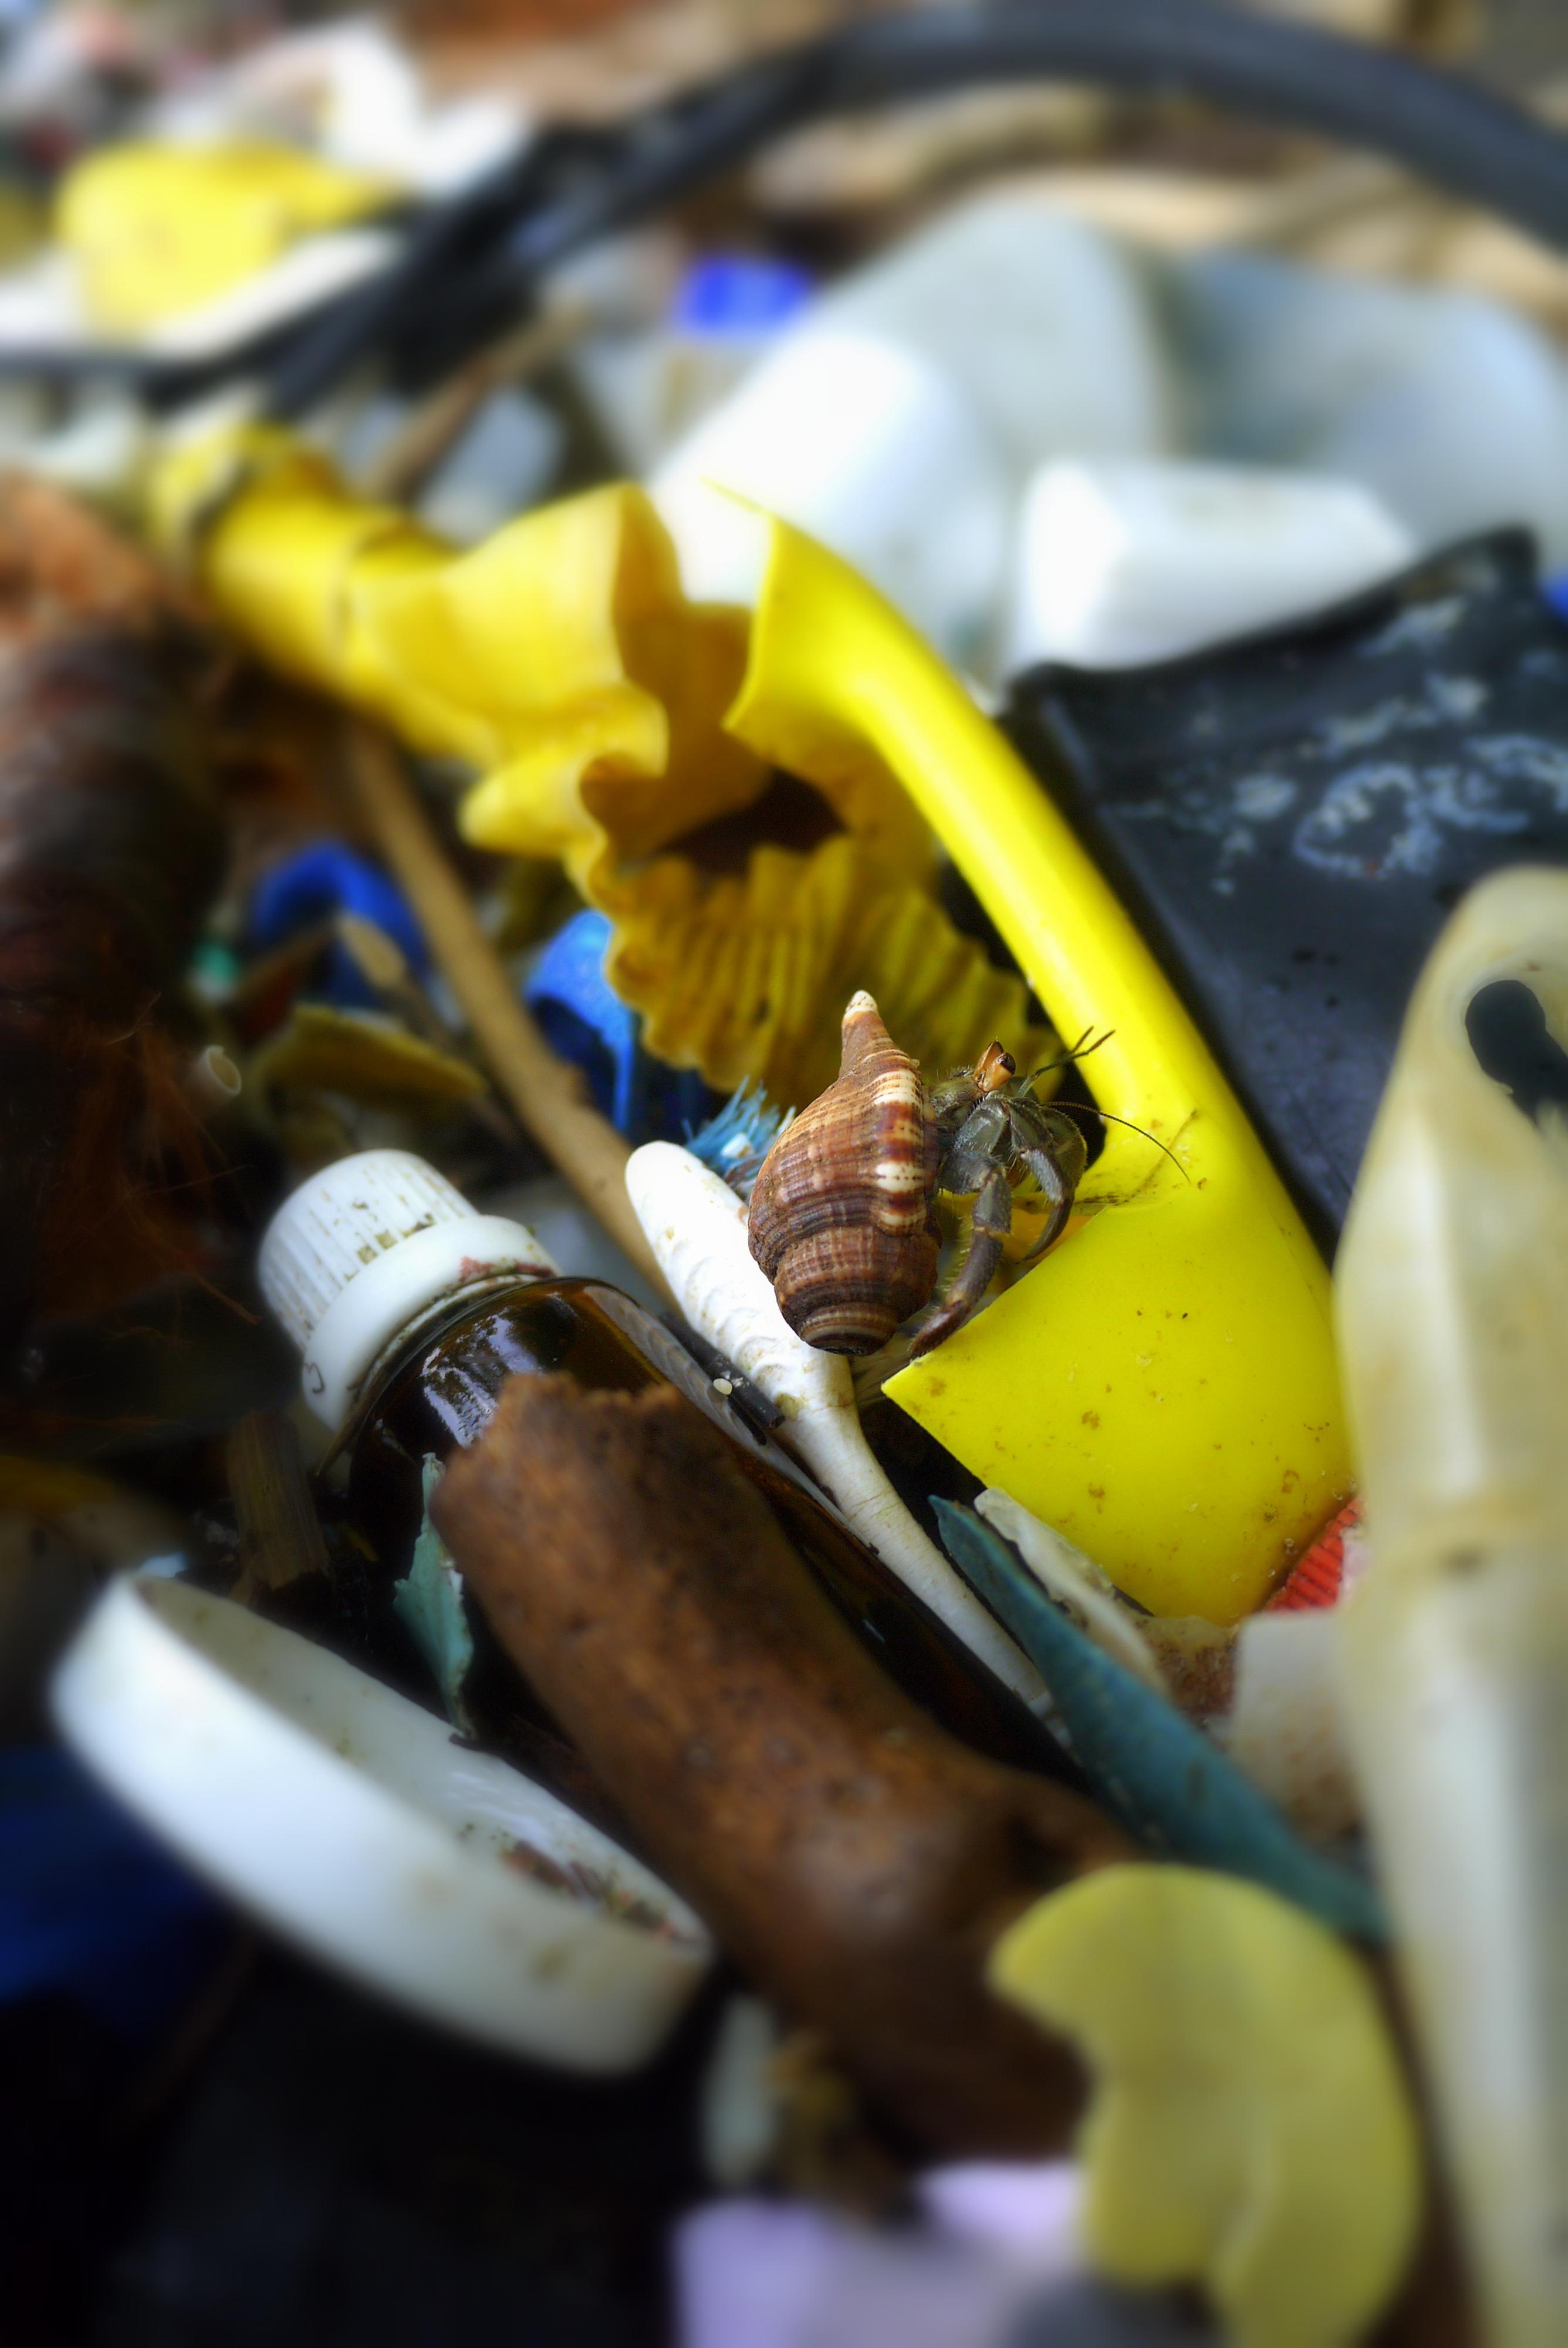 Crab in trash